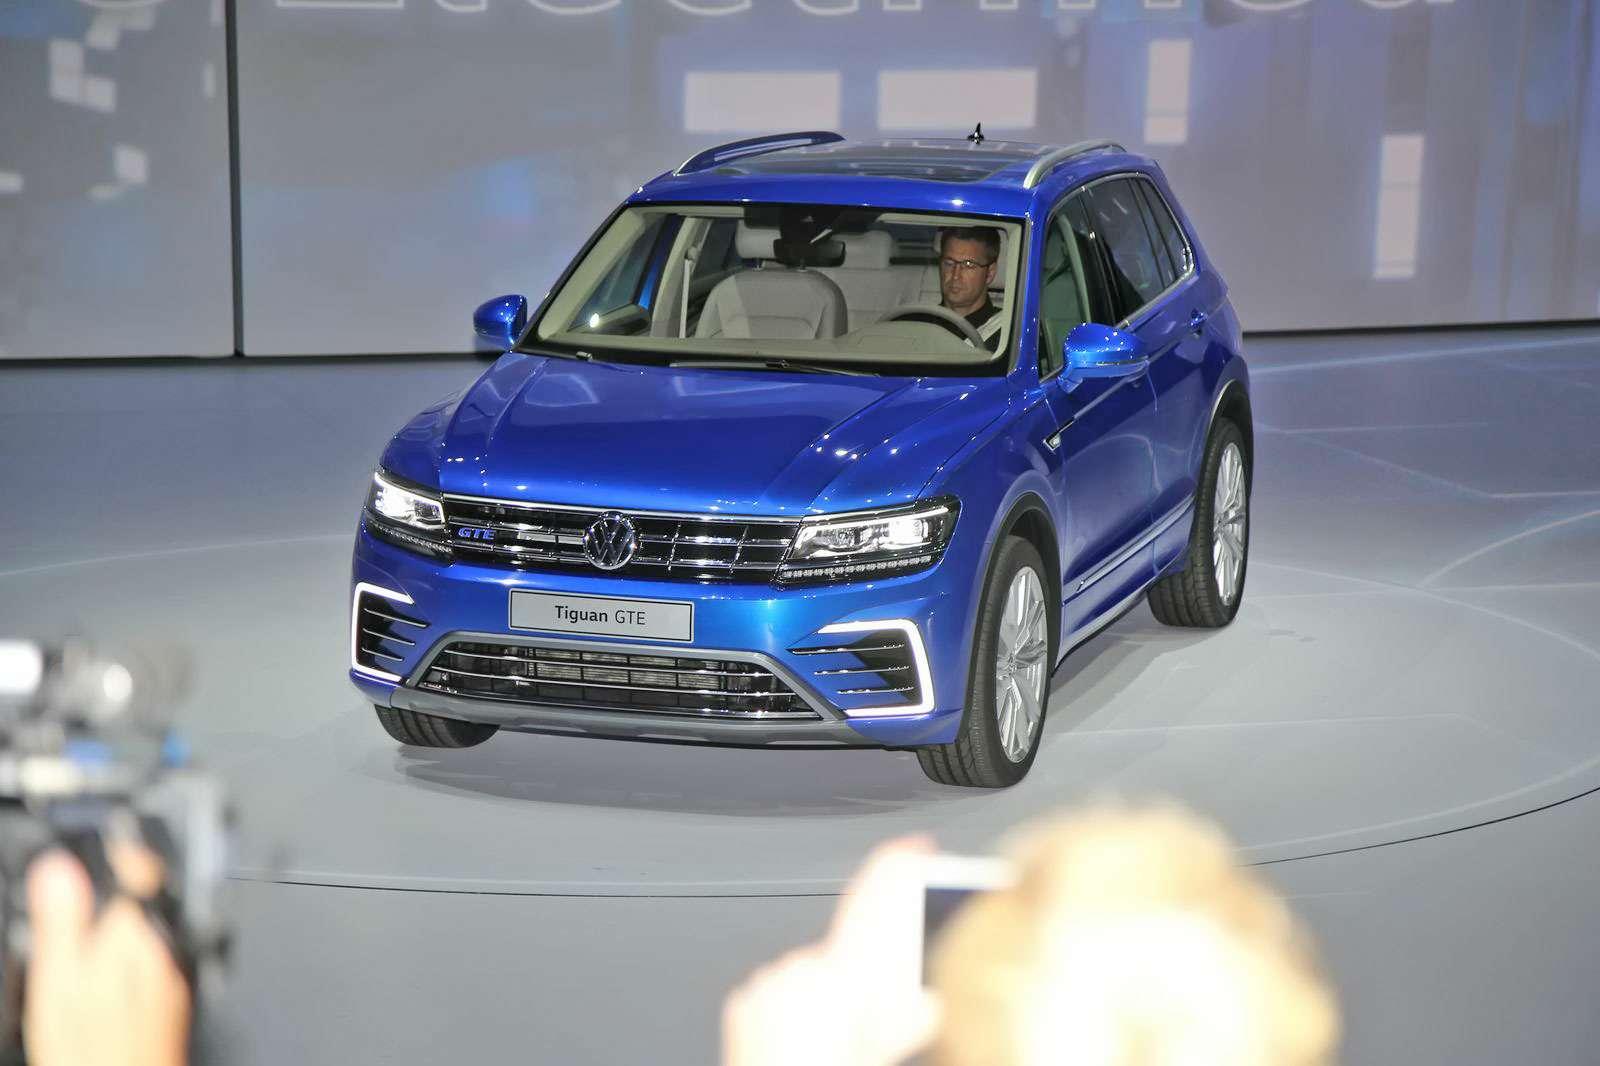 VW_Tiguan_GTE_Kadakov